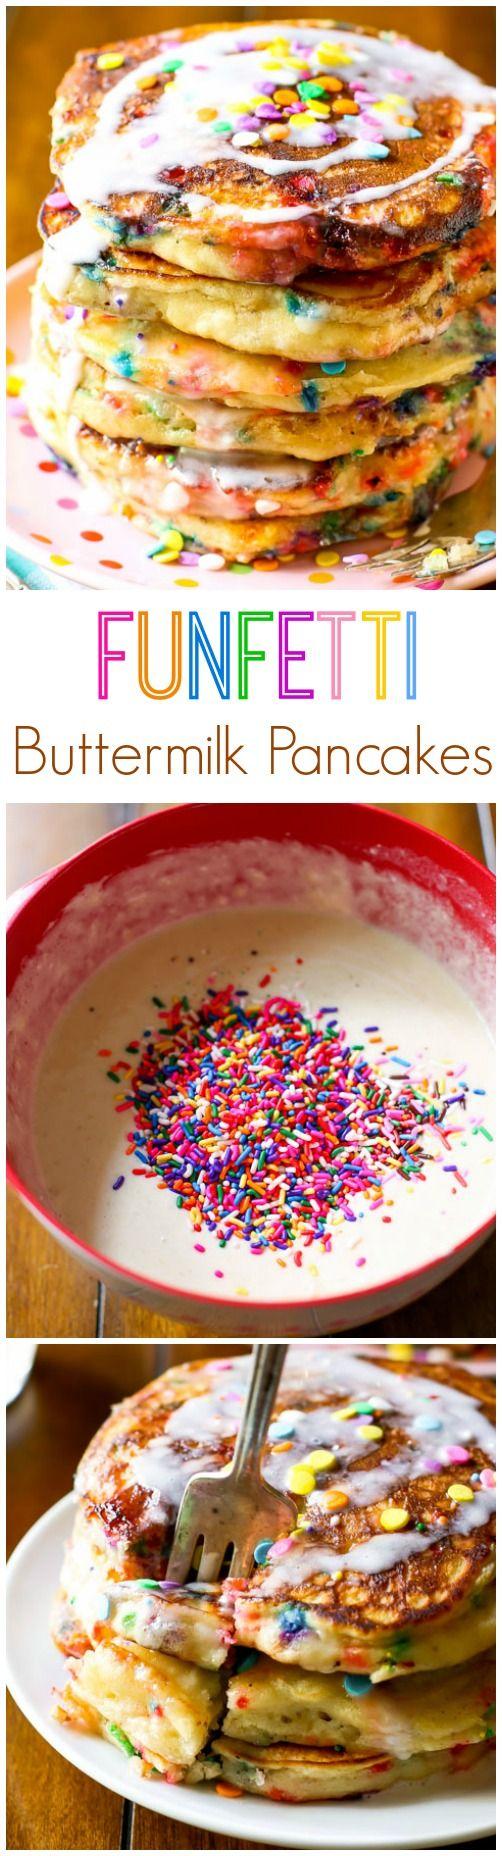 BirthDay breakfast! FUNFETTI Buttermilk Pancakes-- so fluffy, so simple, so perfect, so FUN.